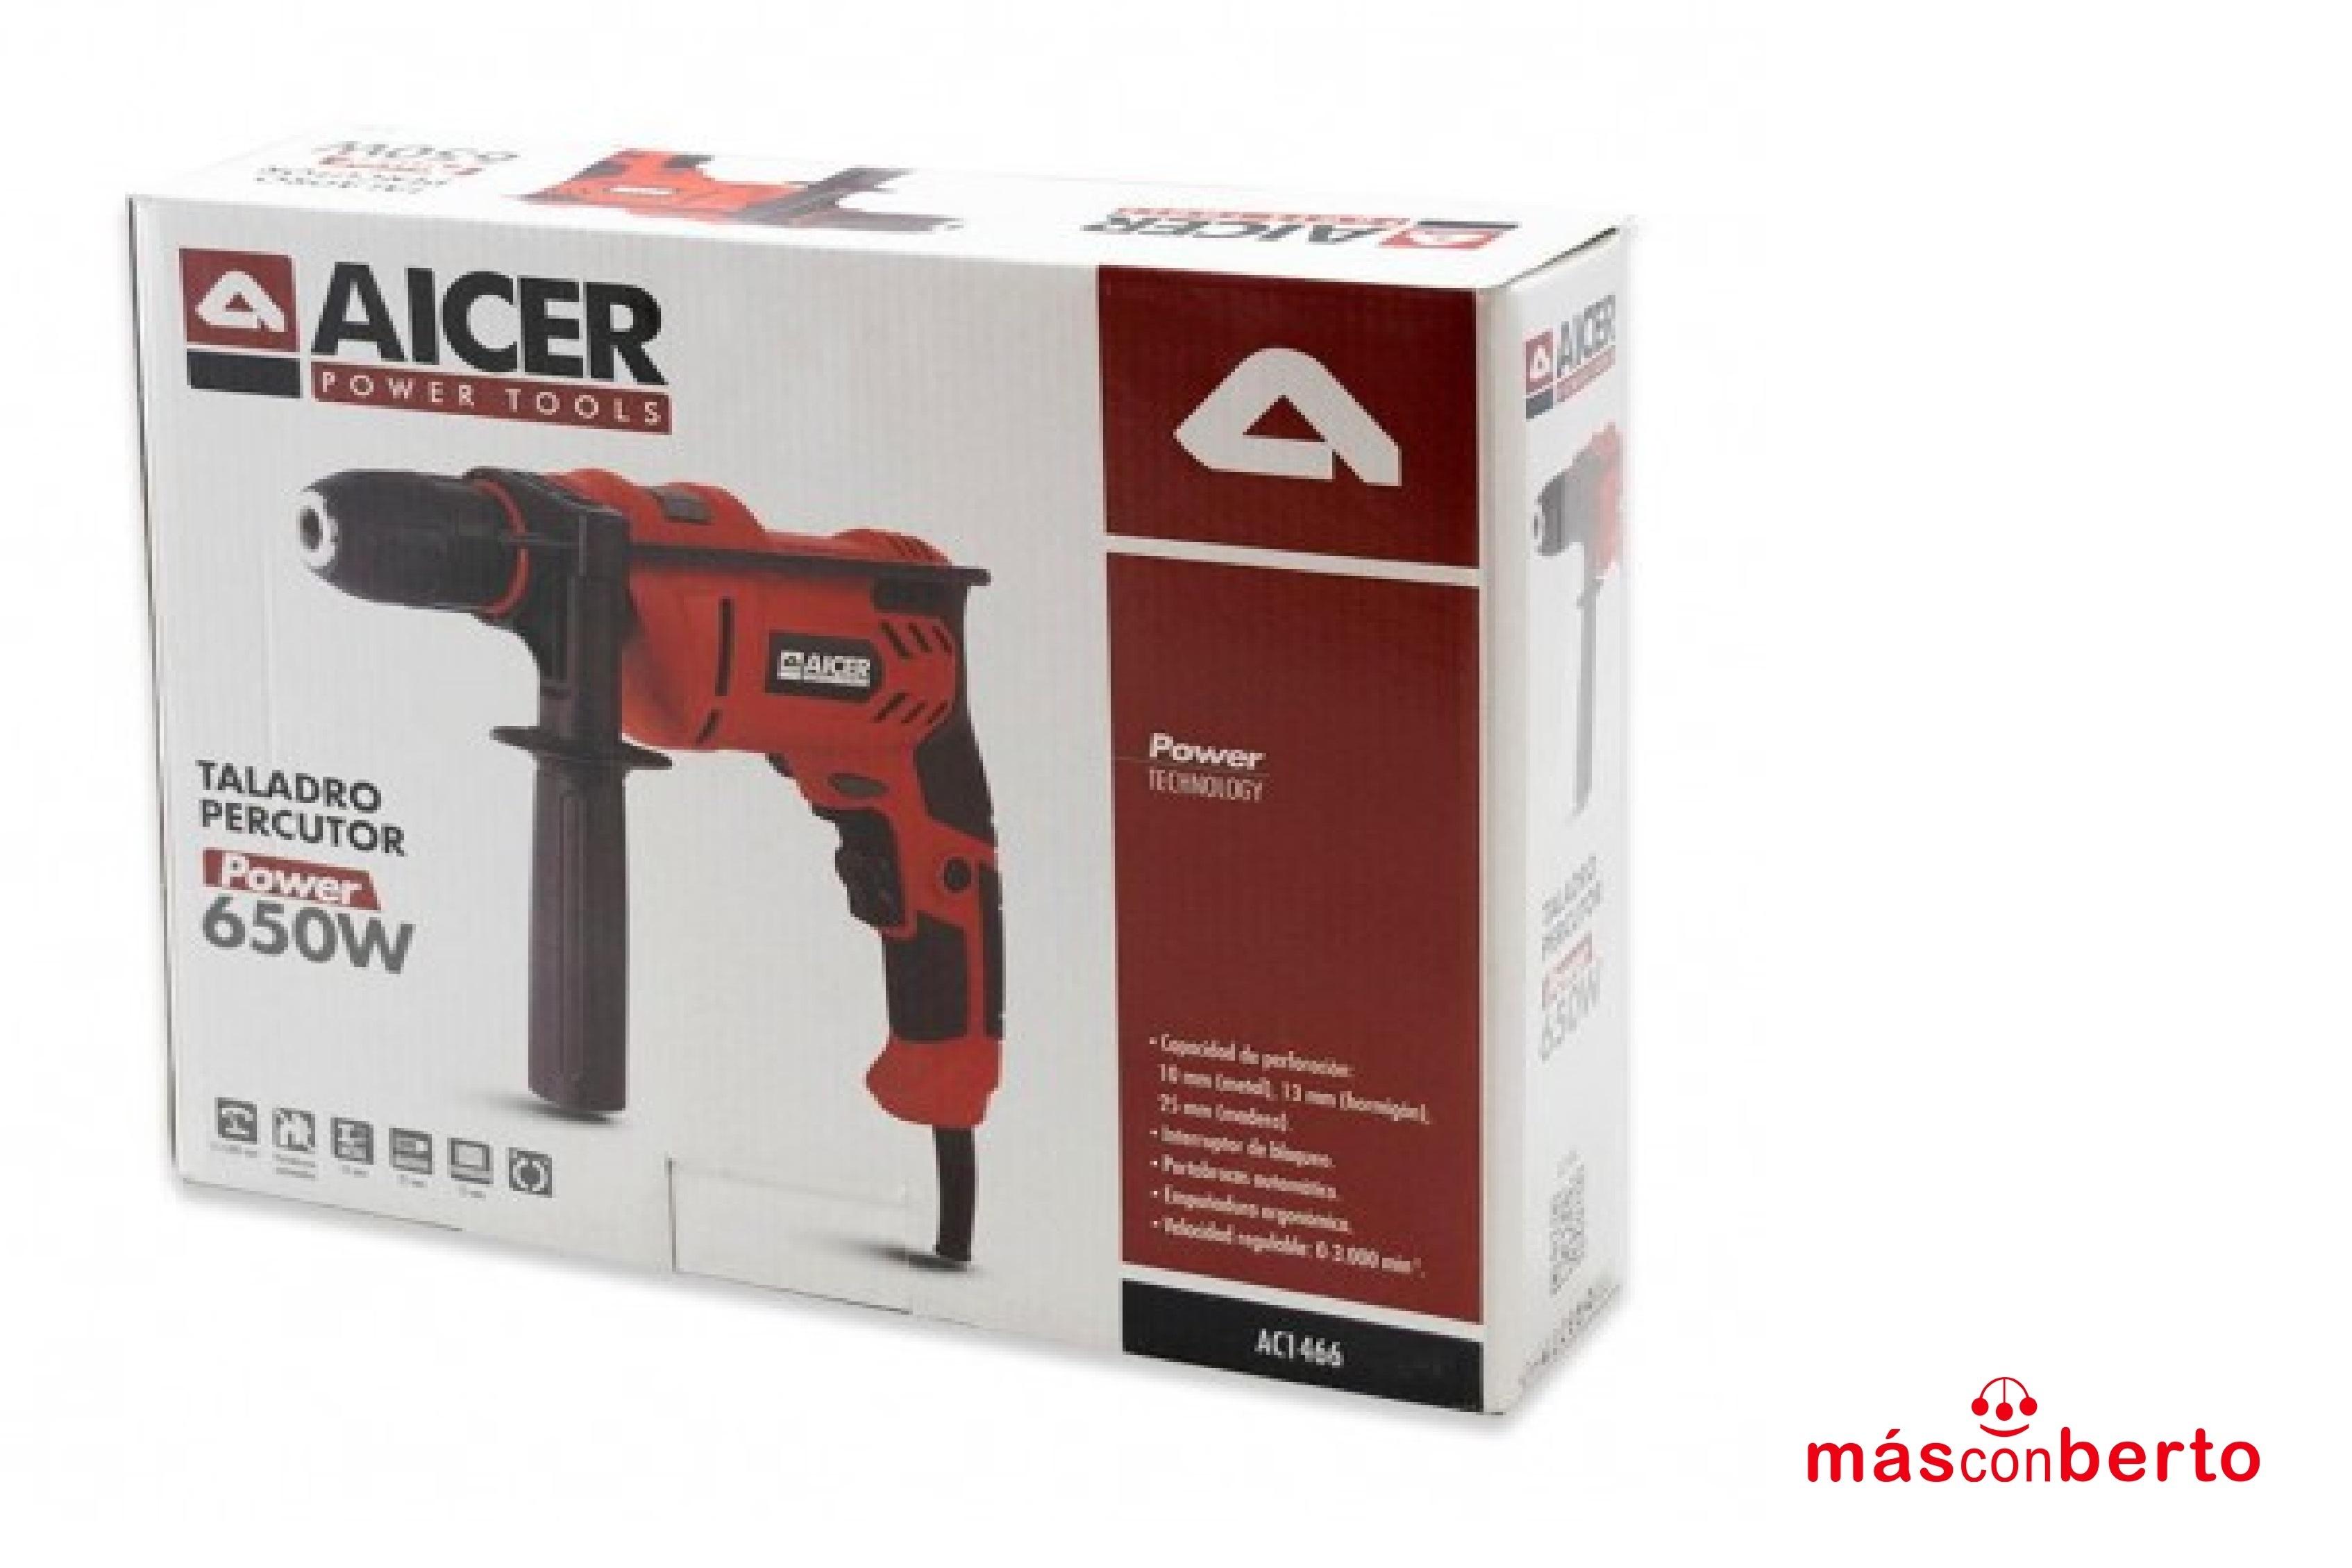 Taladro percutor 650W AC1466